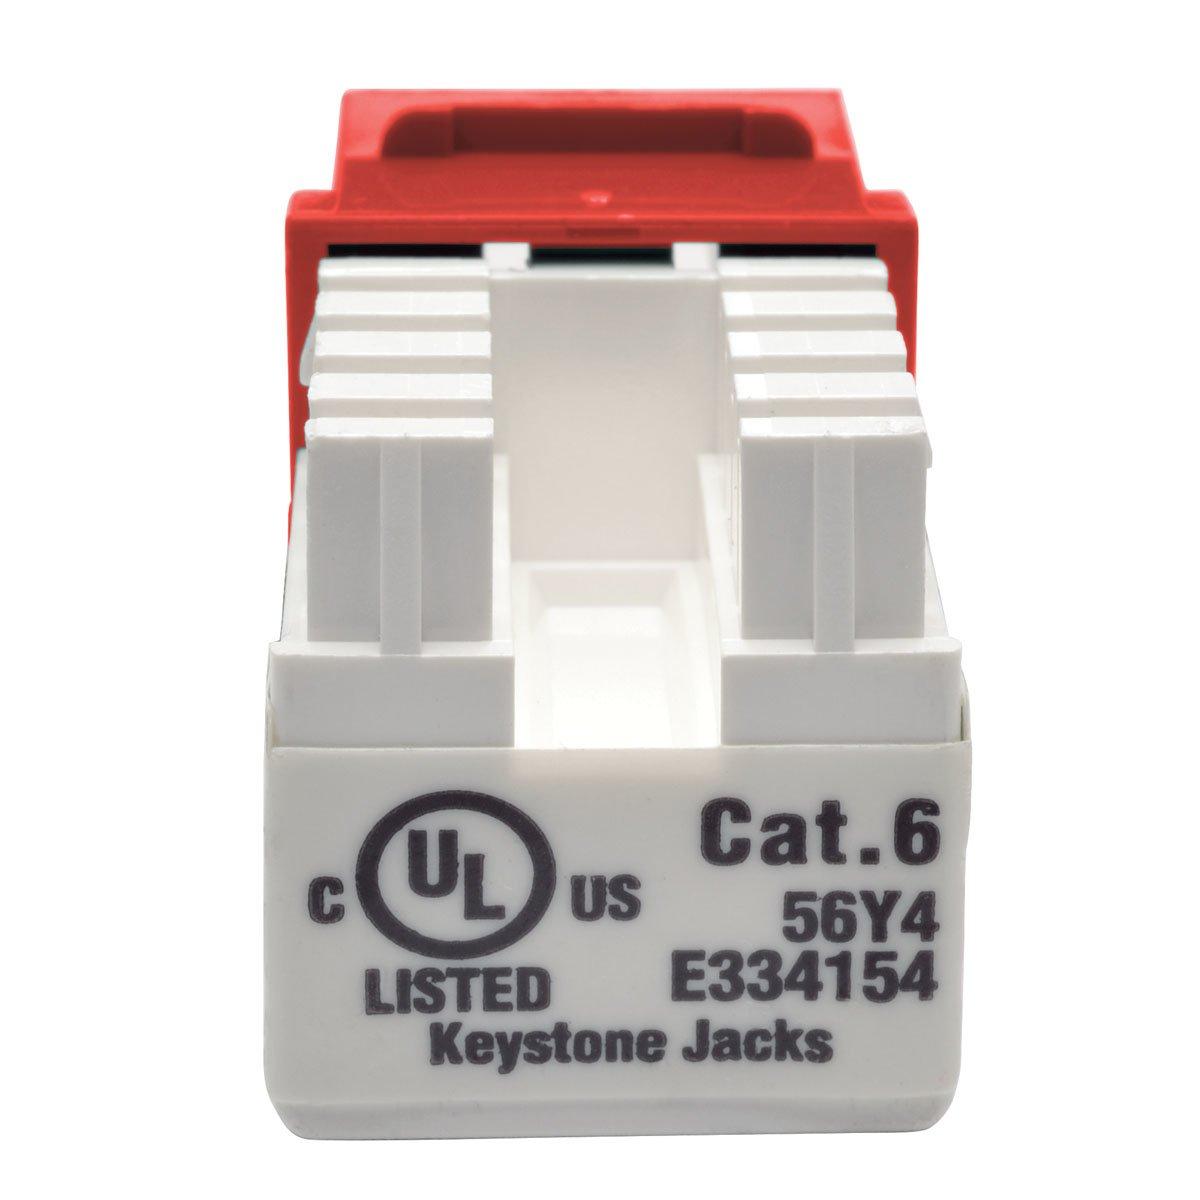 Tripp Lite Cat6 Cat5e 110 Style Punch Down Keystone Jack Wiring Red Taa Gsa N238 001 Rd Electronics